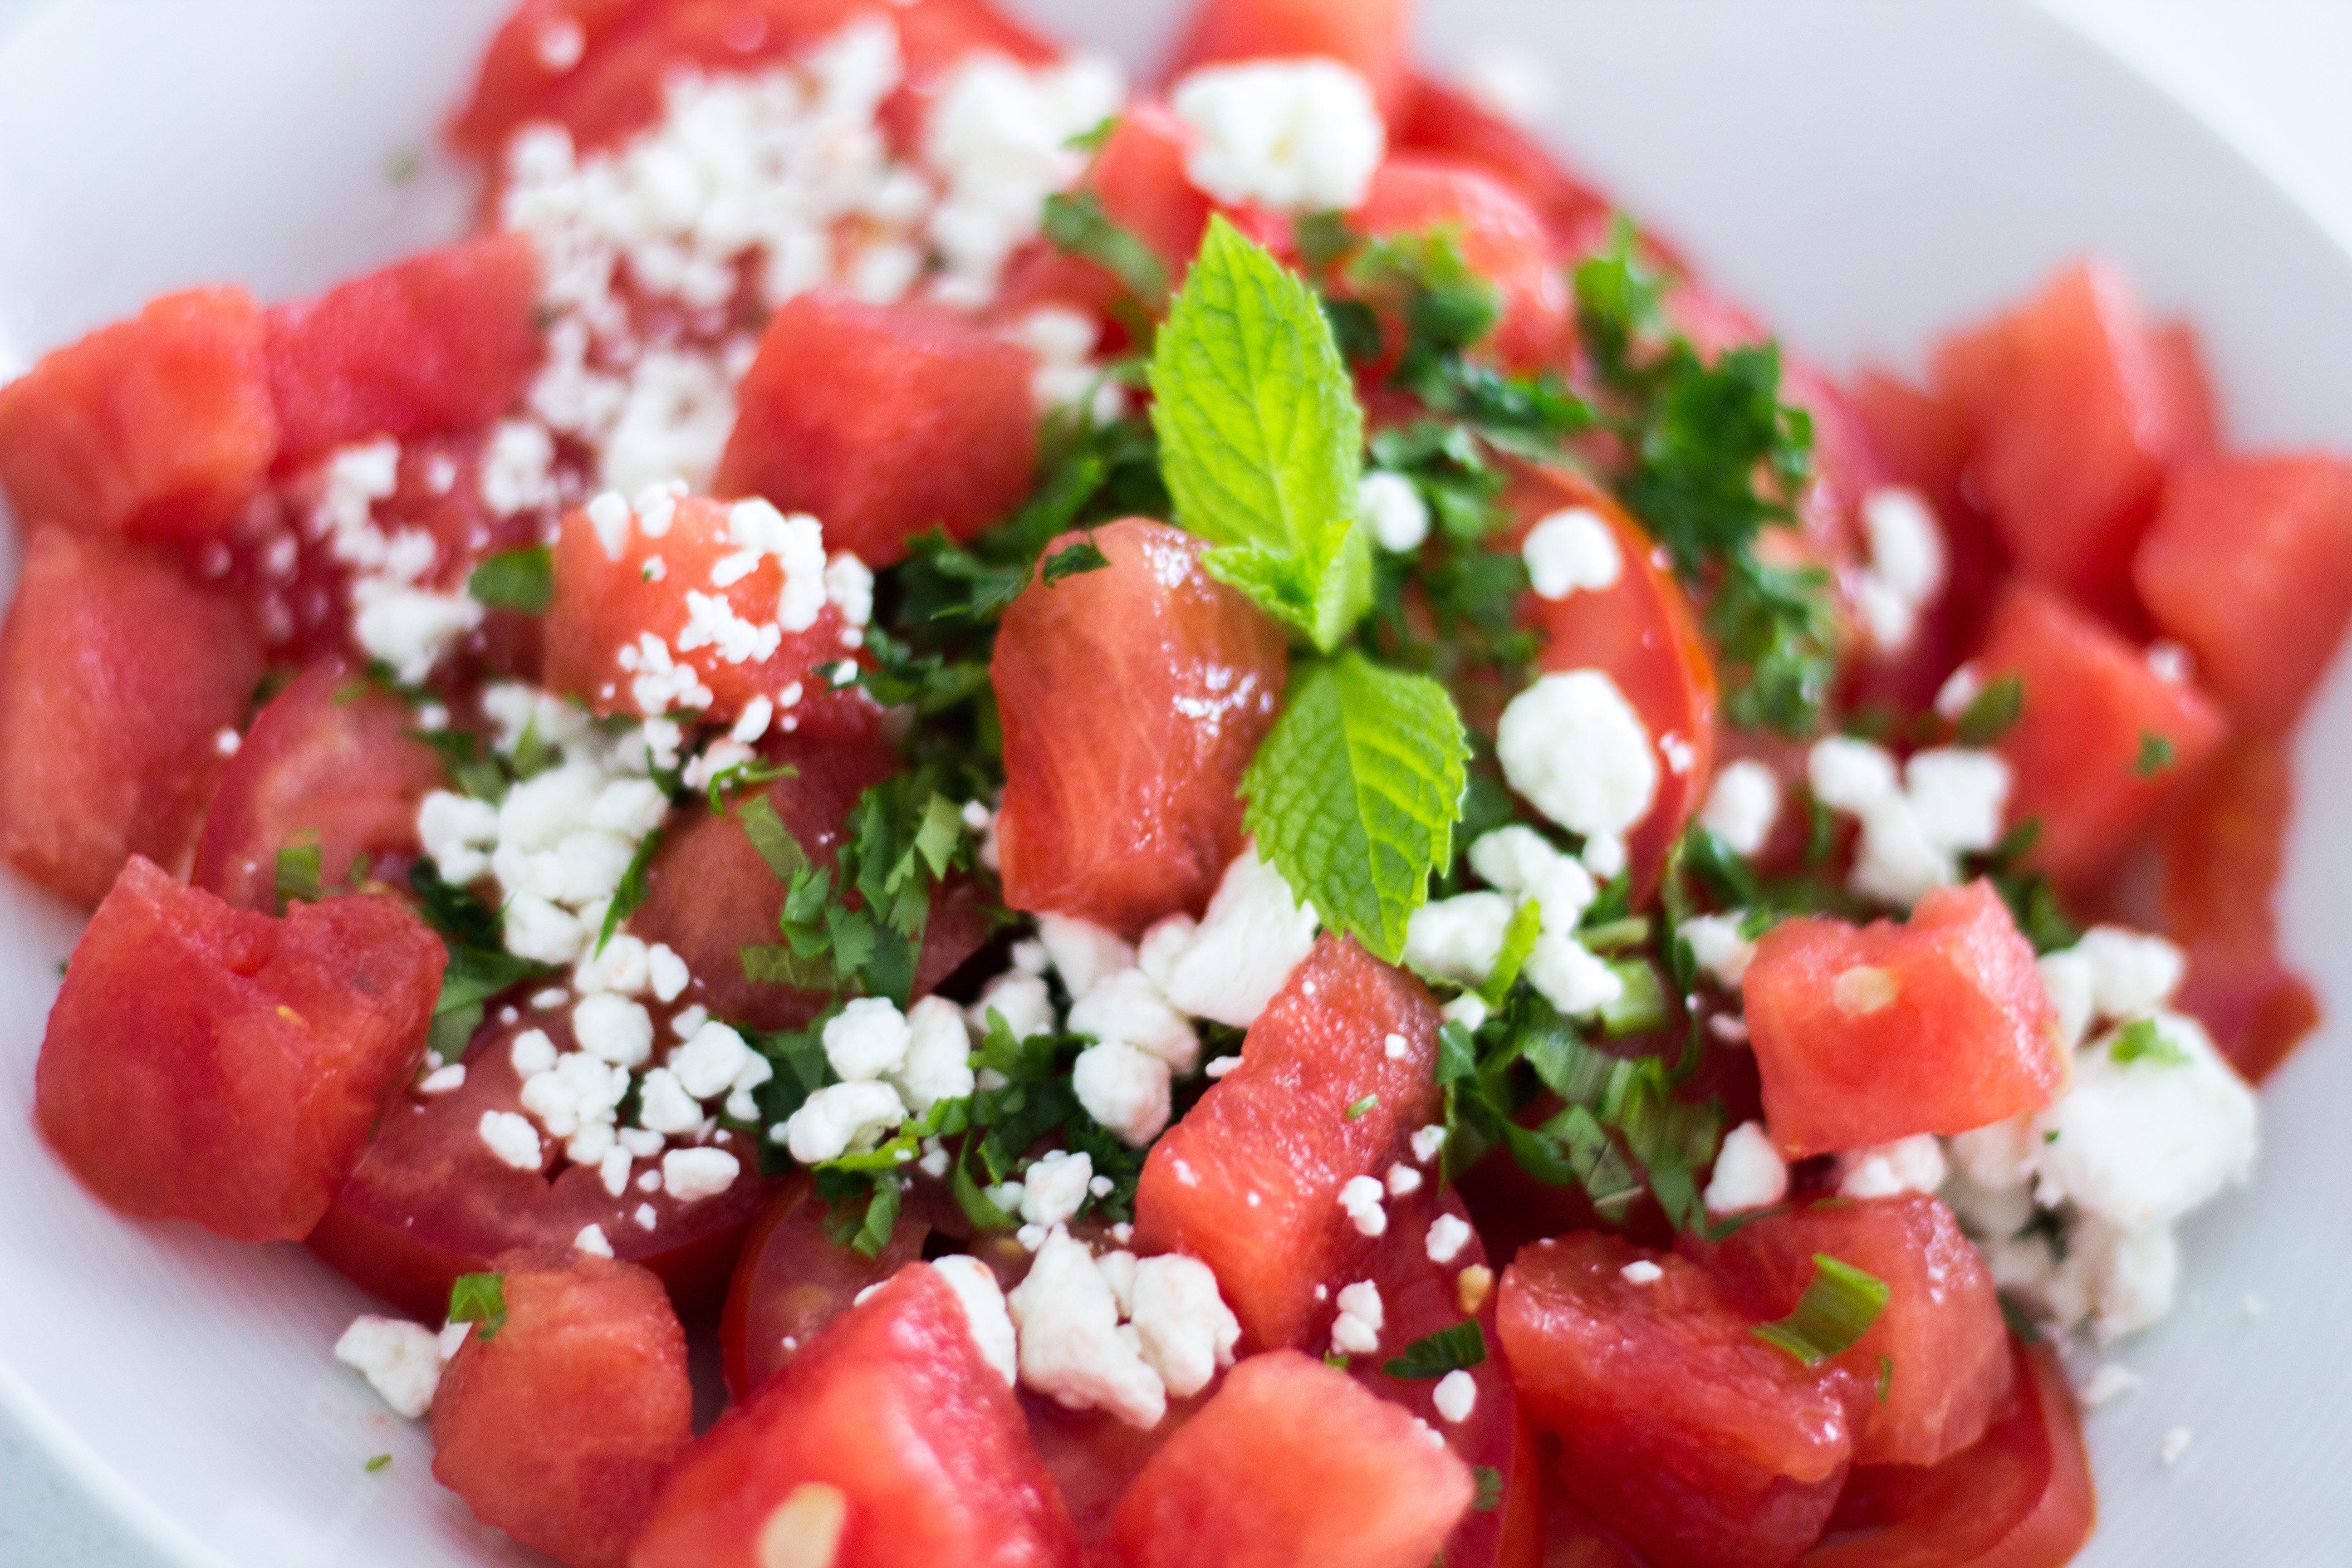 Refreshing Watermelon Tomato Salad Recipe